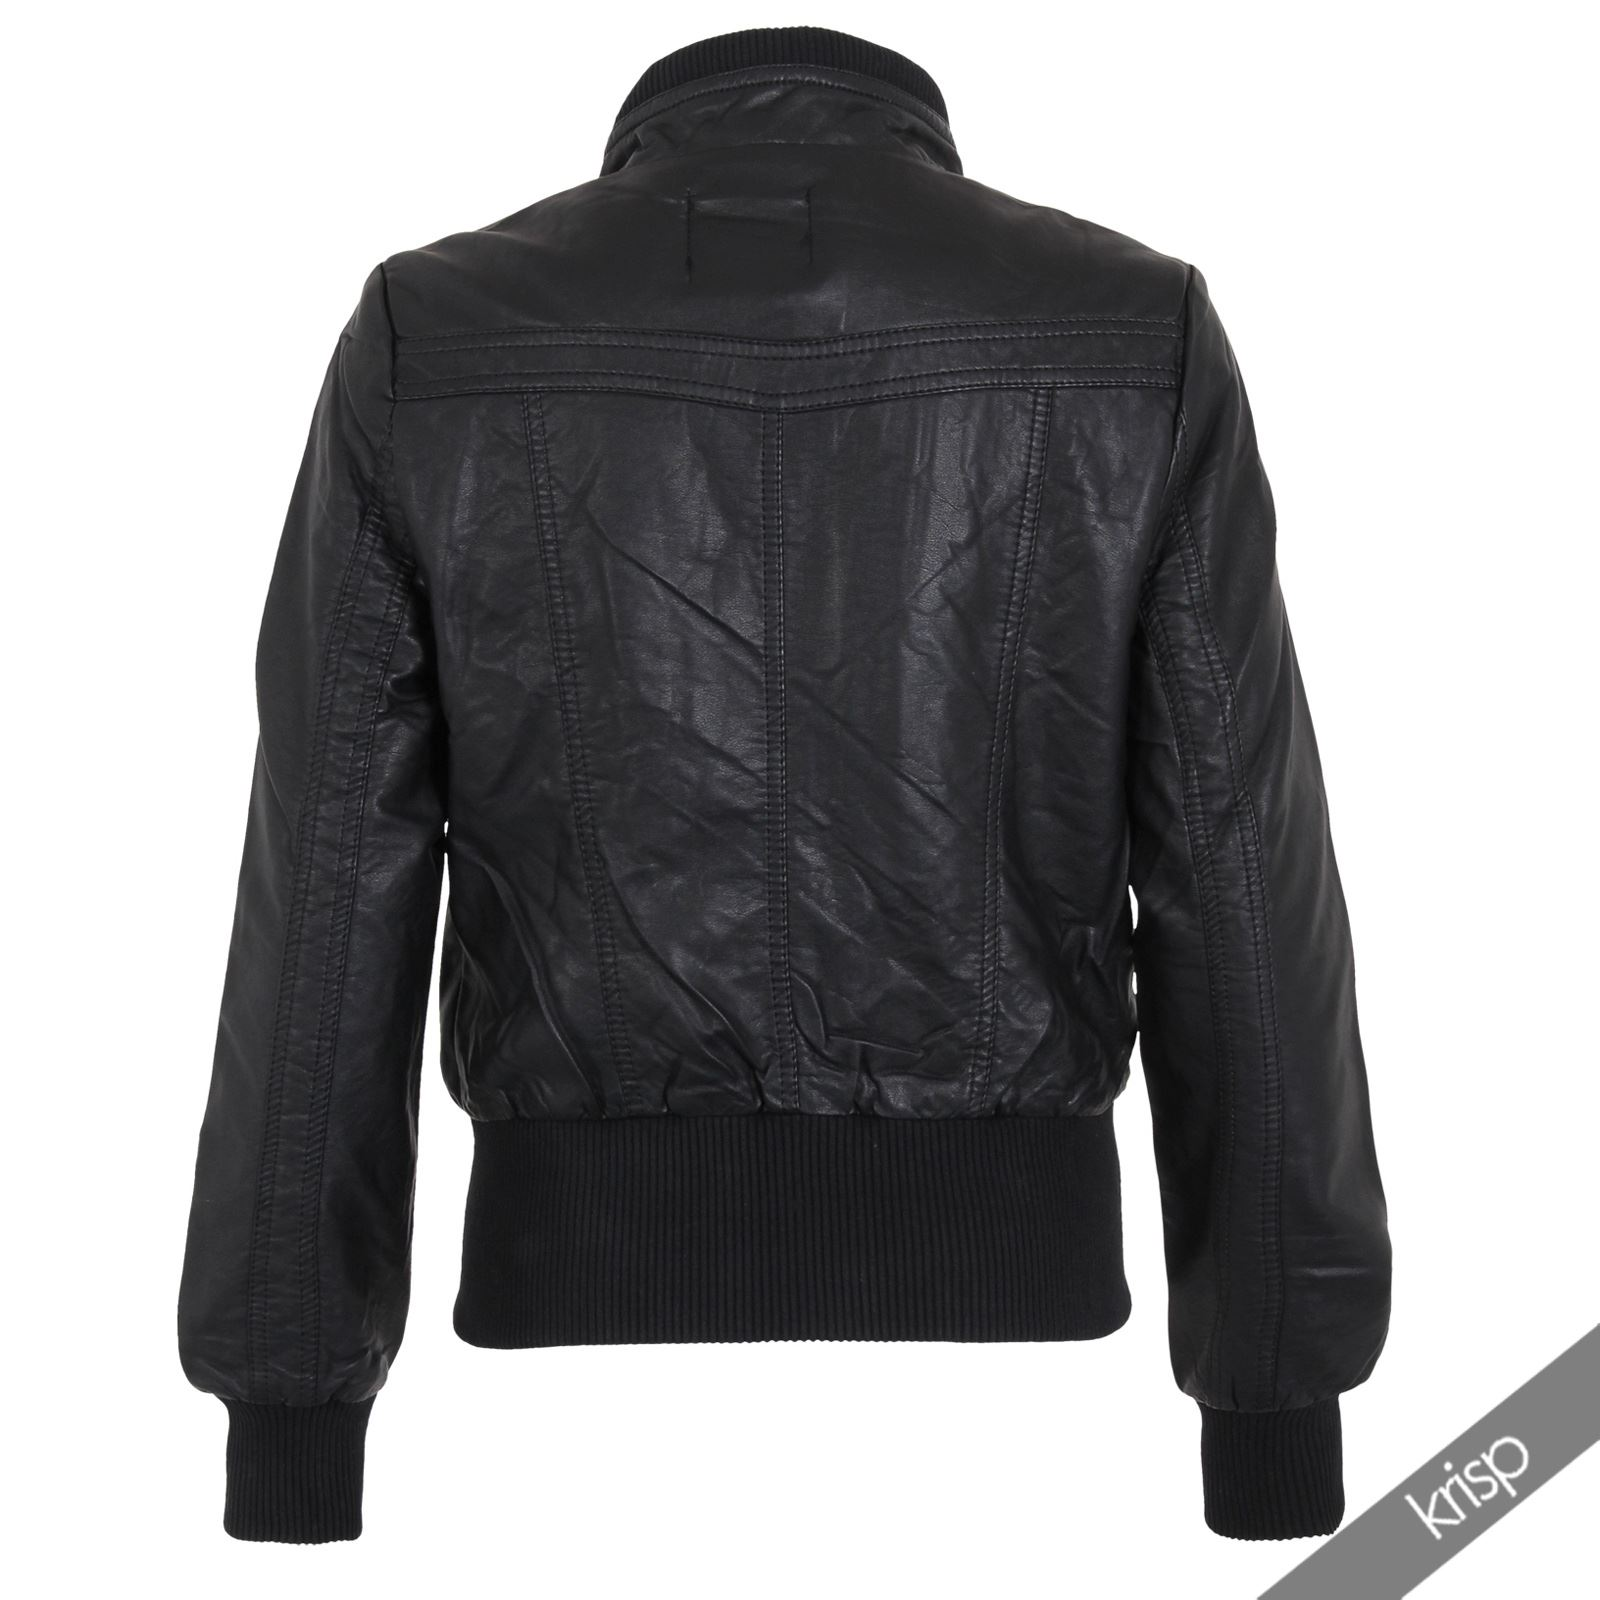 Womens Retro Soft PU Leather High Neck Cropped Waist Bomber Biker Jacket Zipper